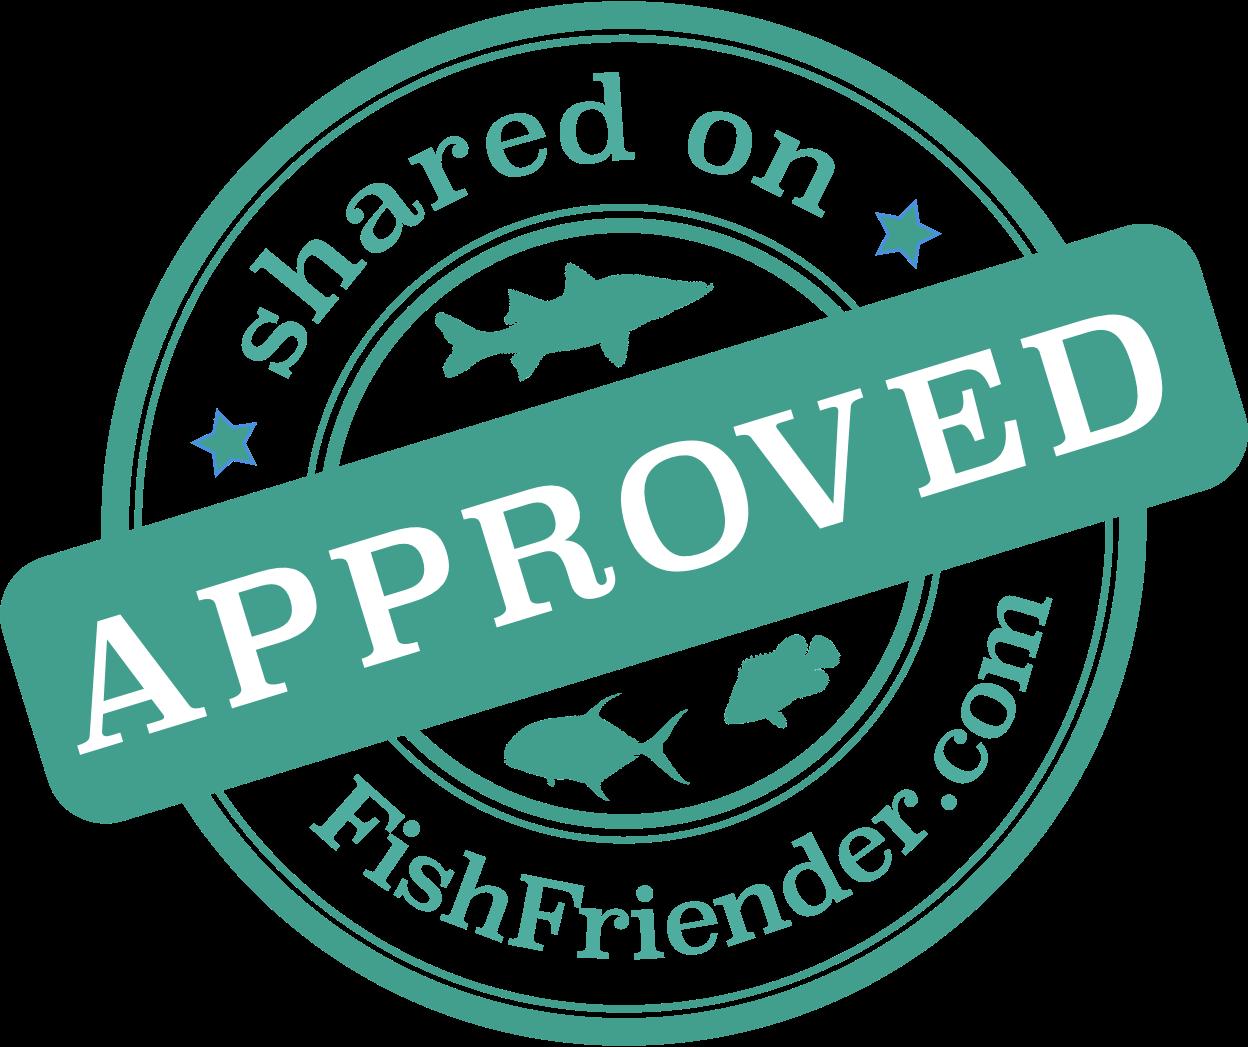 FishFriender for business